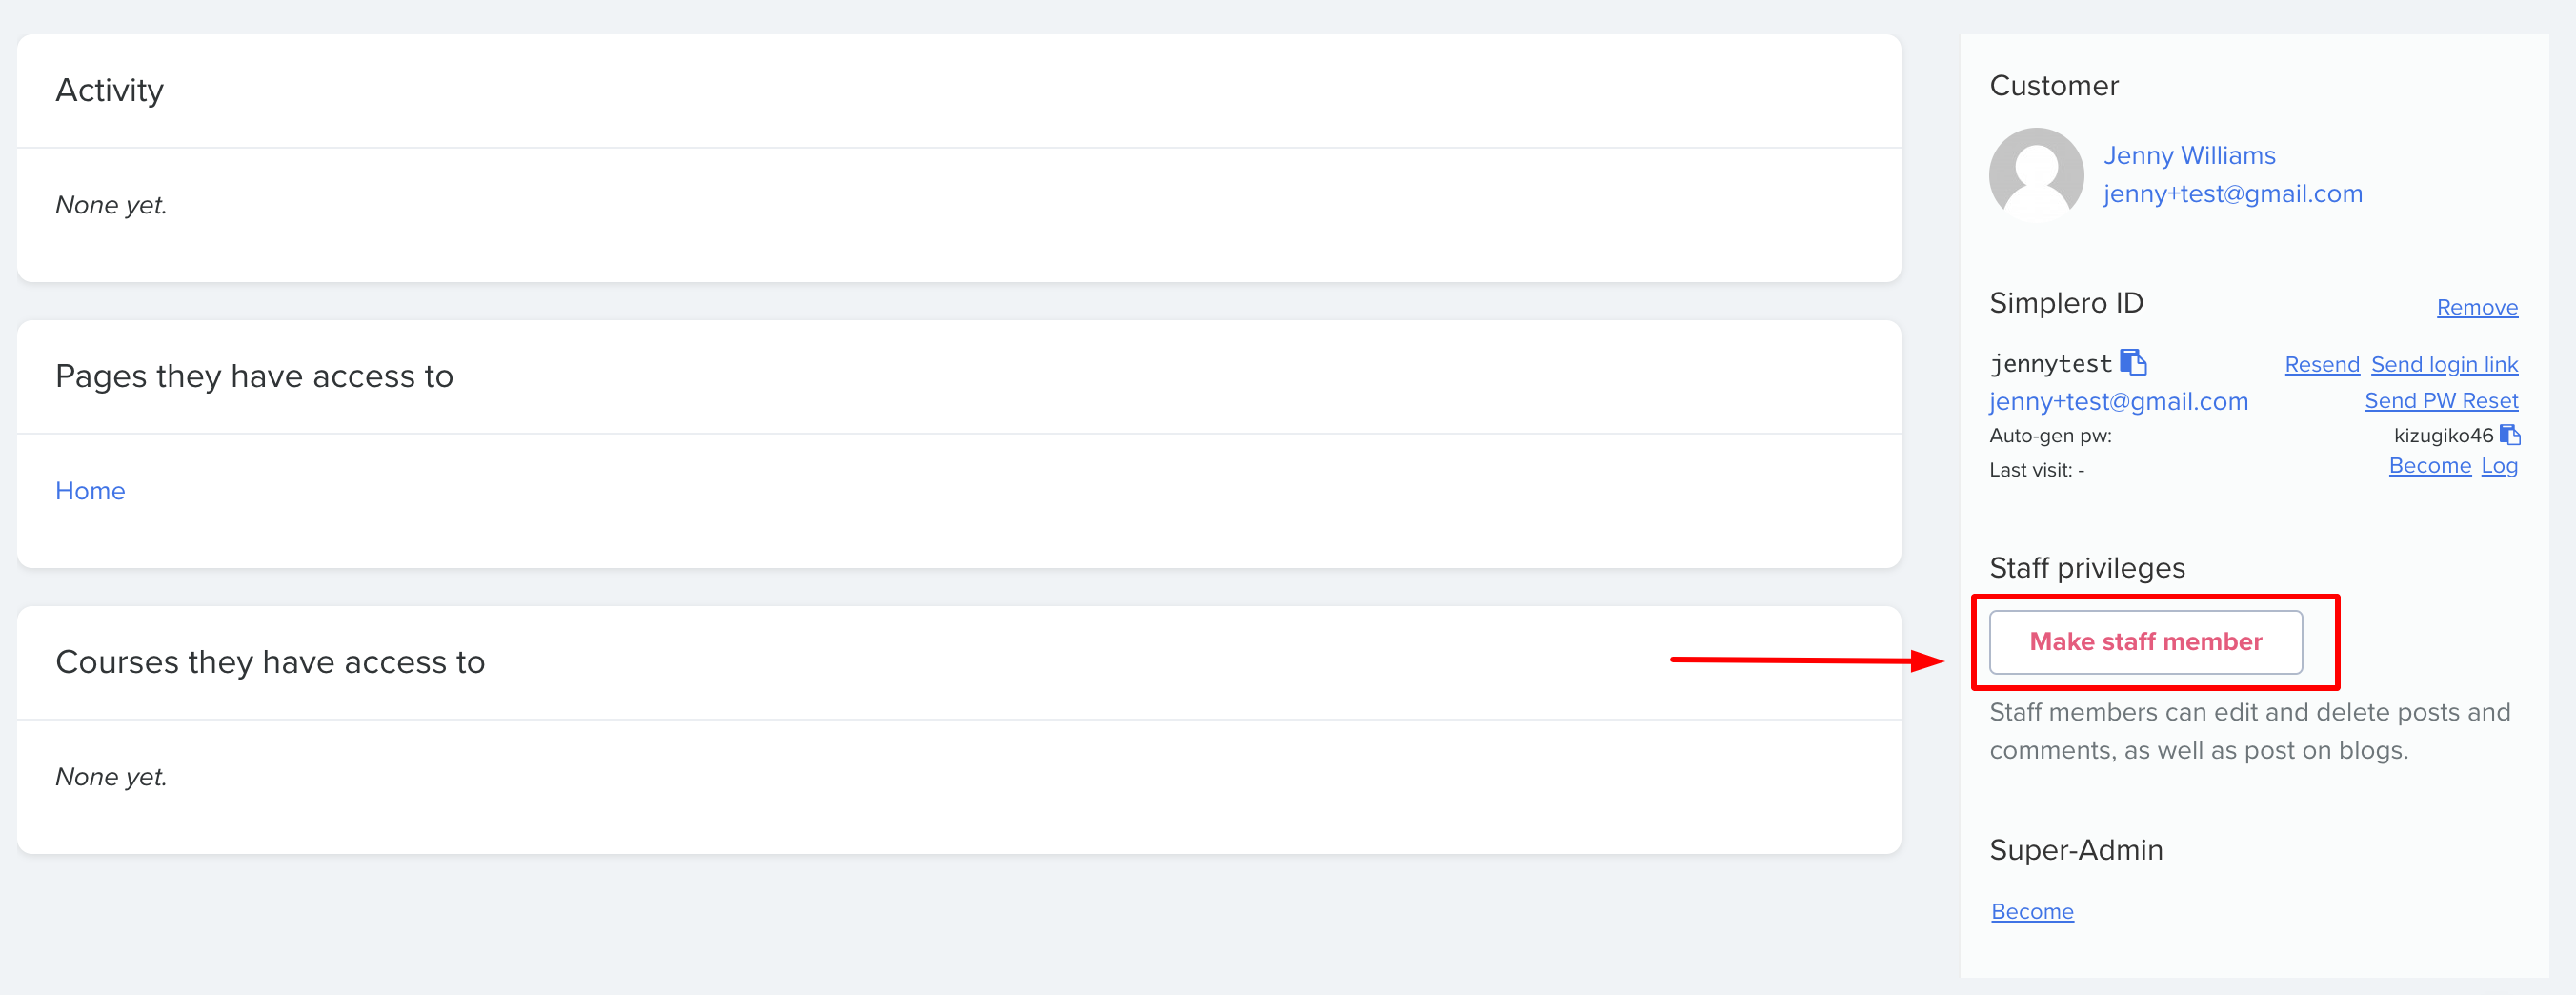 Make_staff_member_button_for_blog_poster